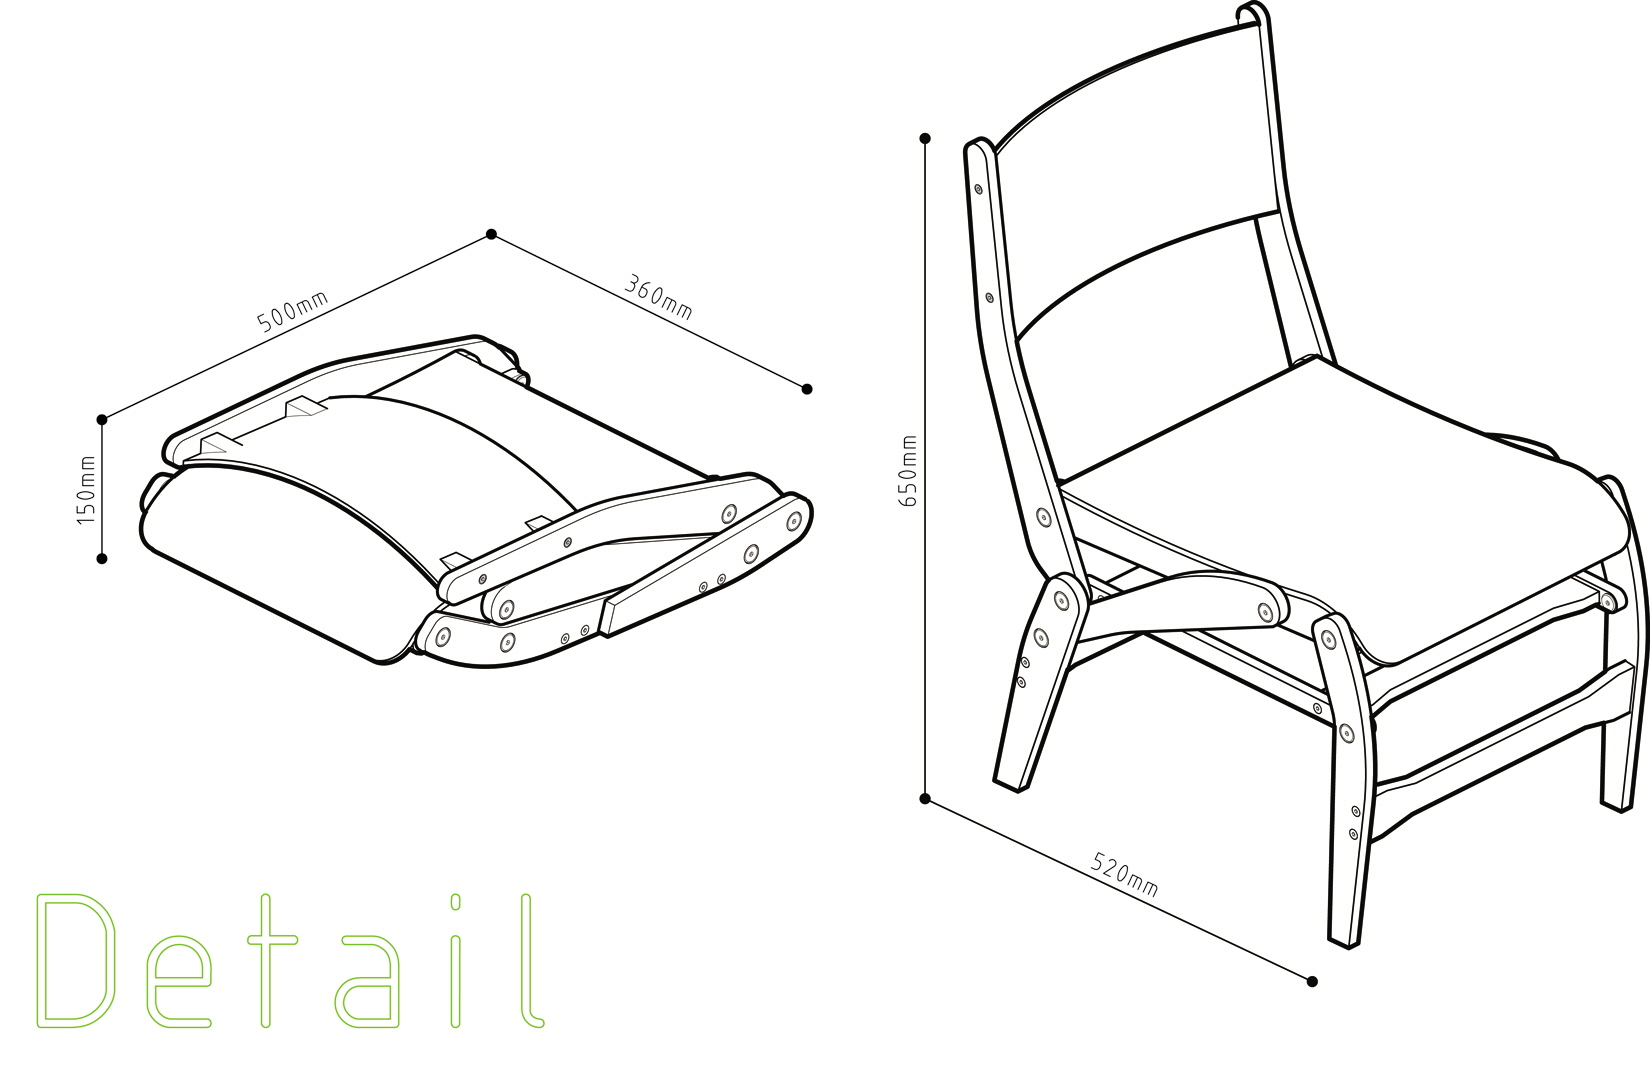 folding chair by Jacob Murray at Coroflot